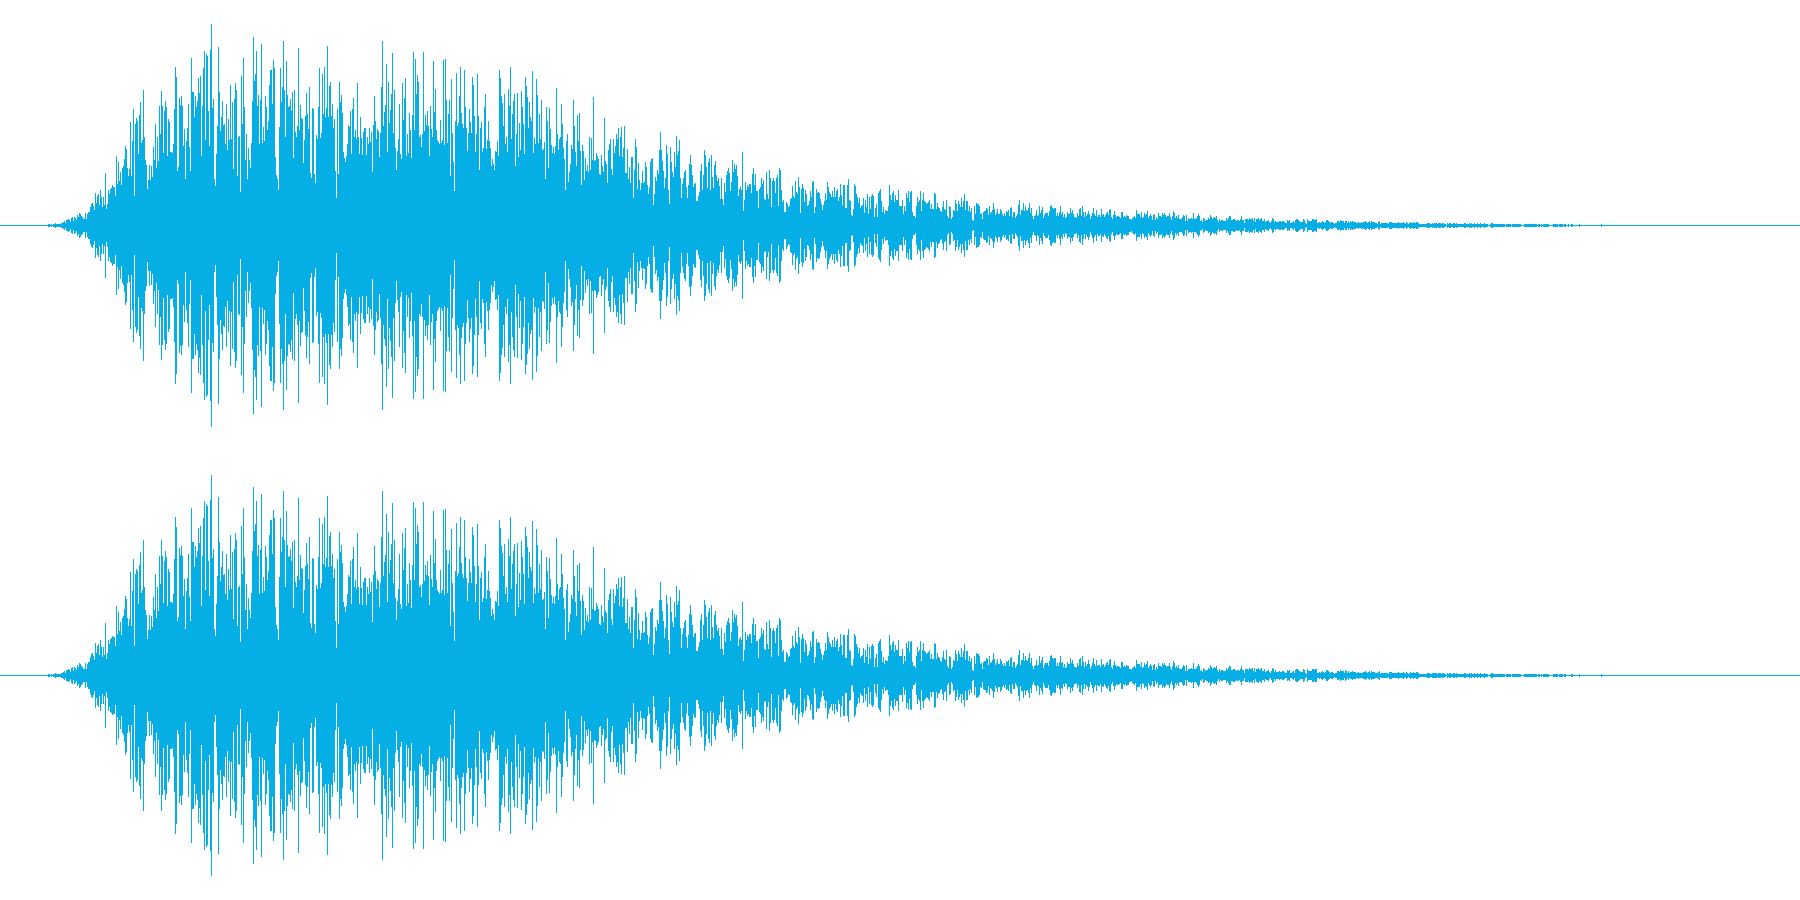 SNES 野球01-10(歓声)の再生済みの波形